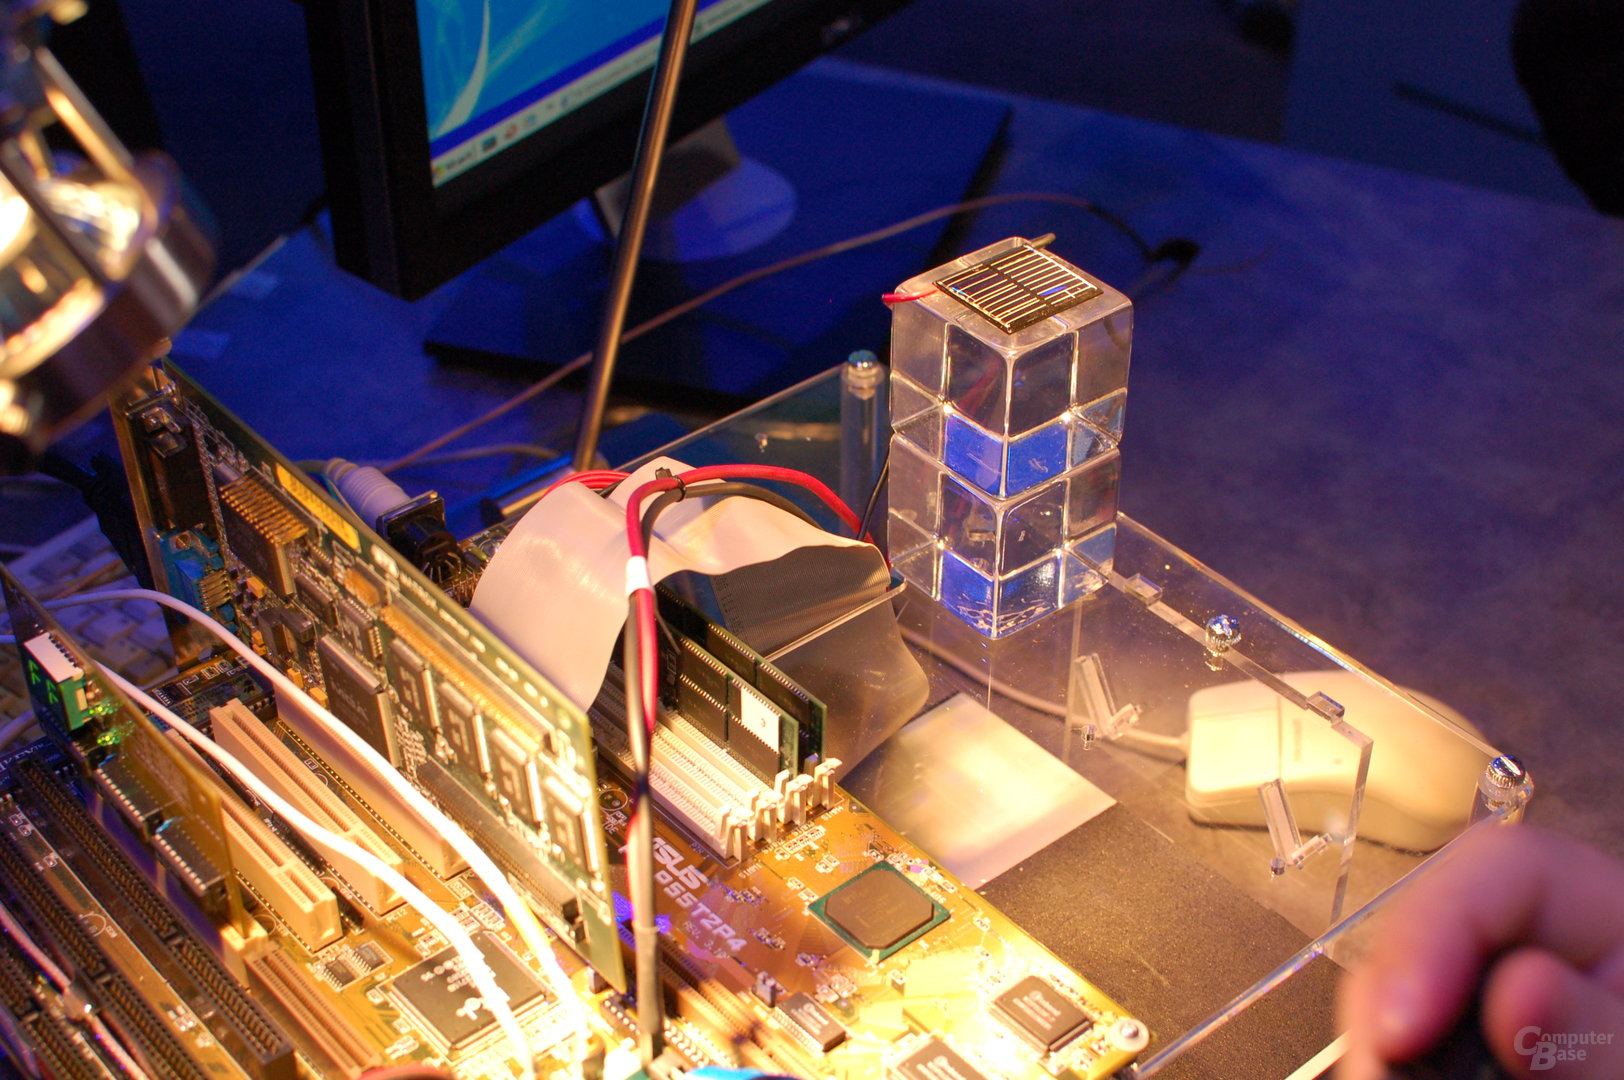 Demo-System mit Solar-betriebenem Prozessor